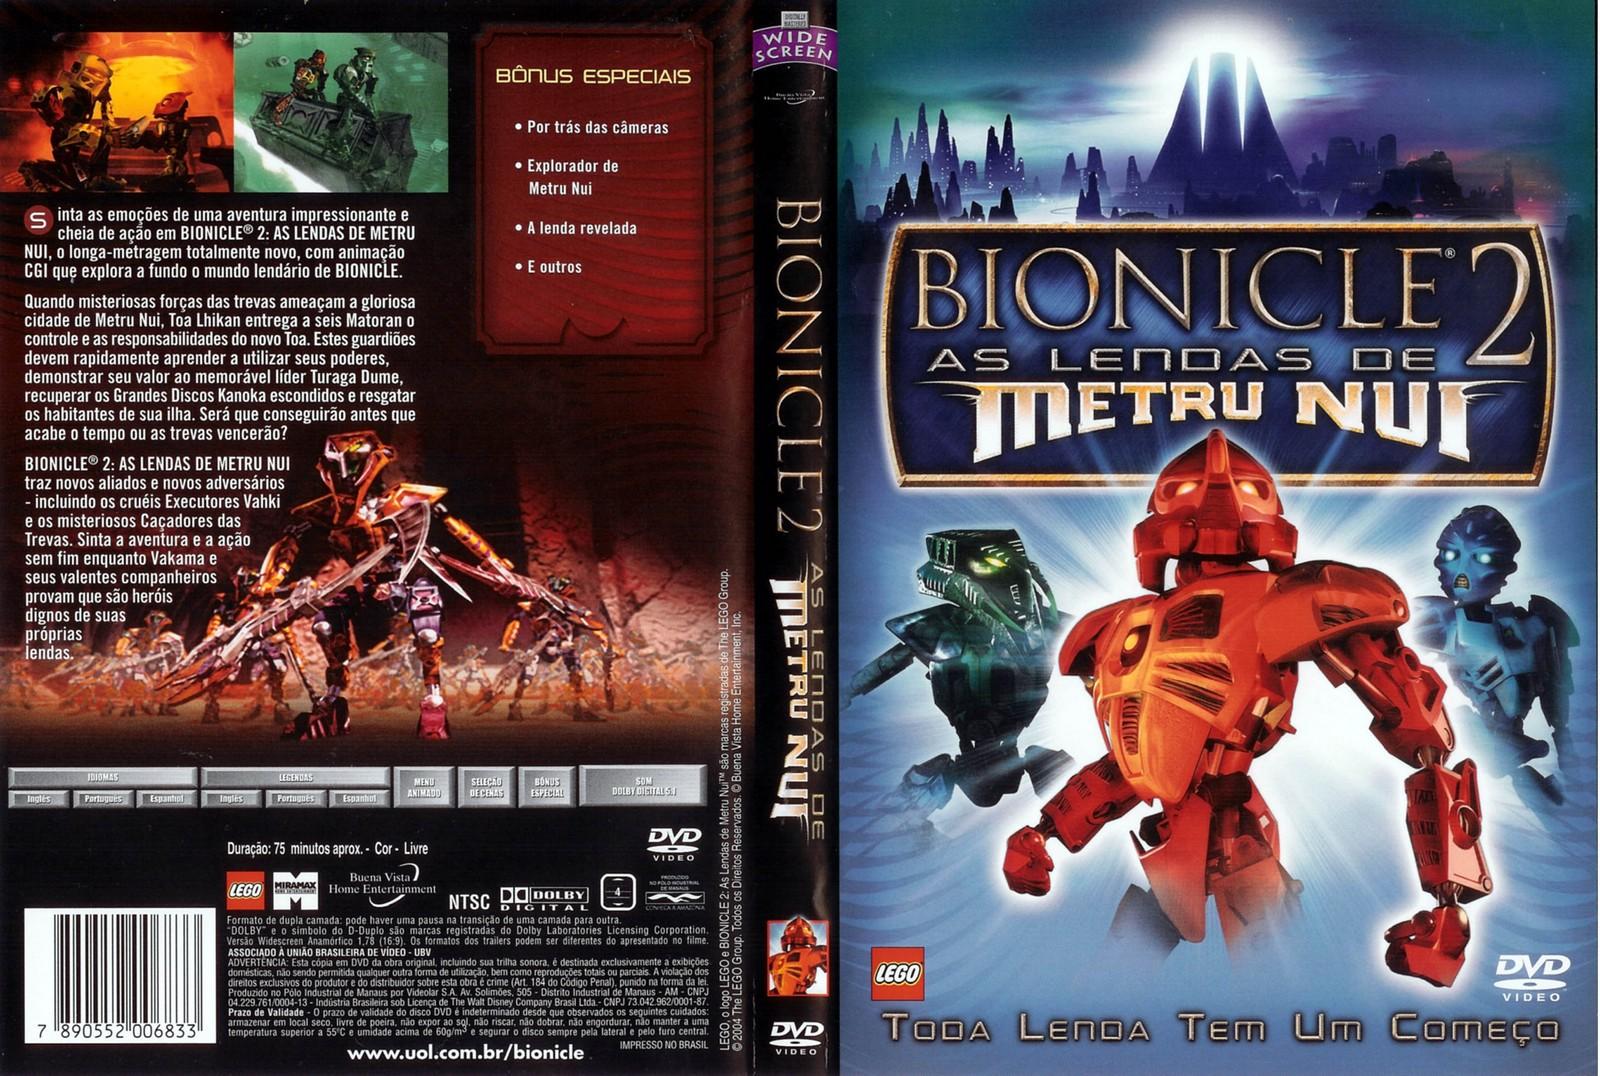 Gatomia capa dvd cover